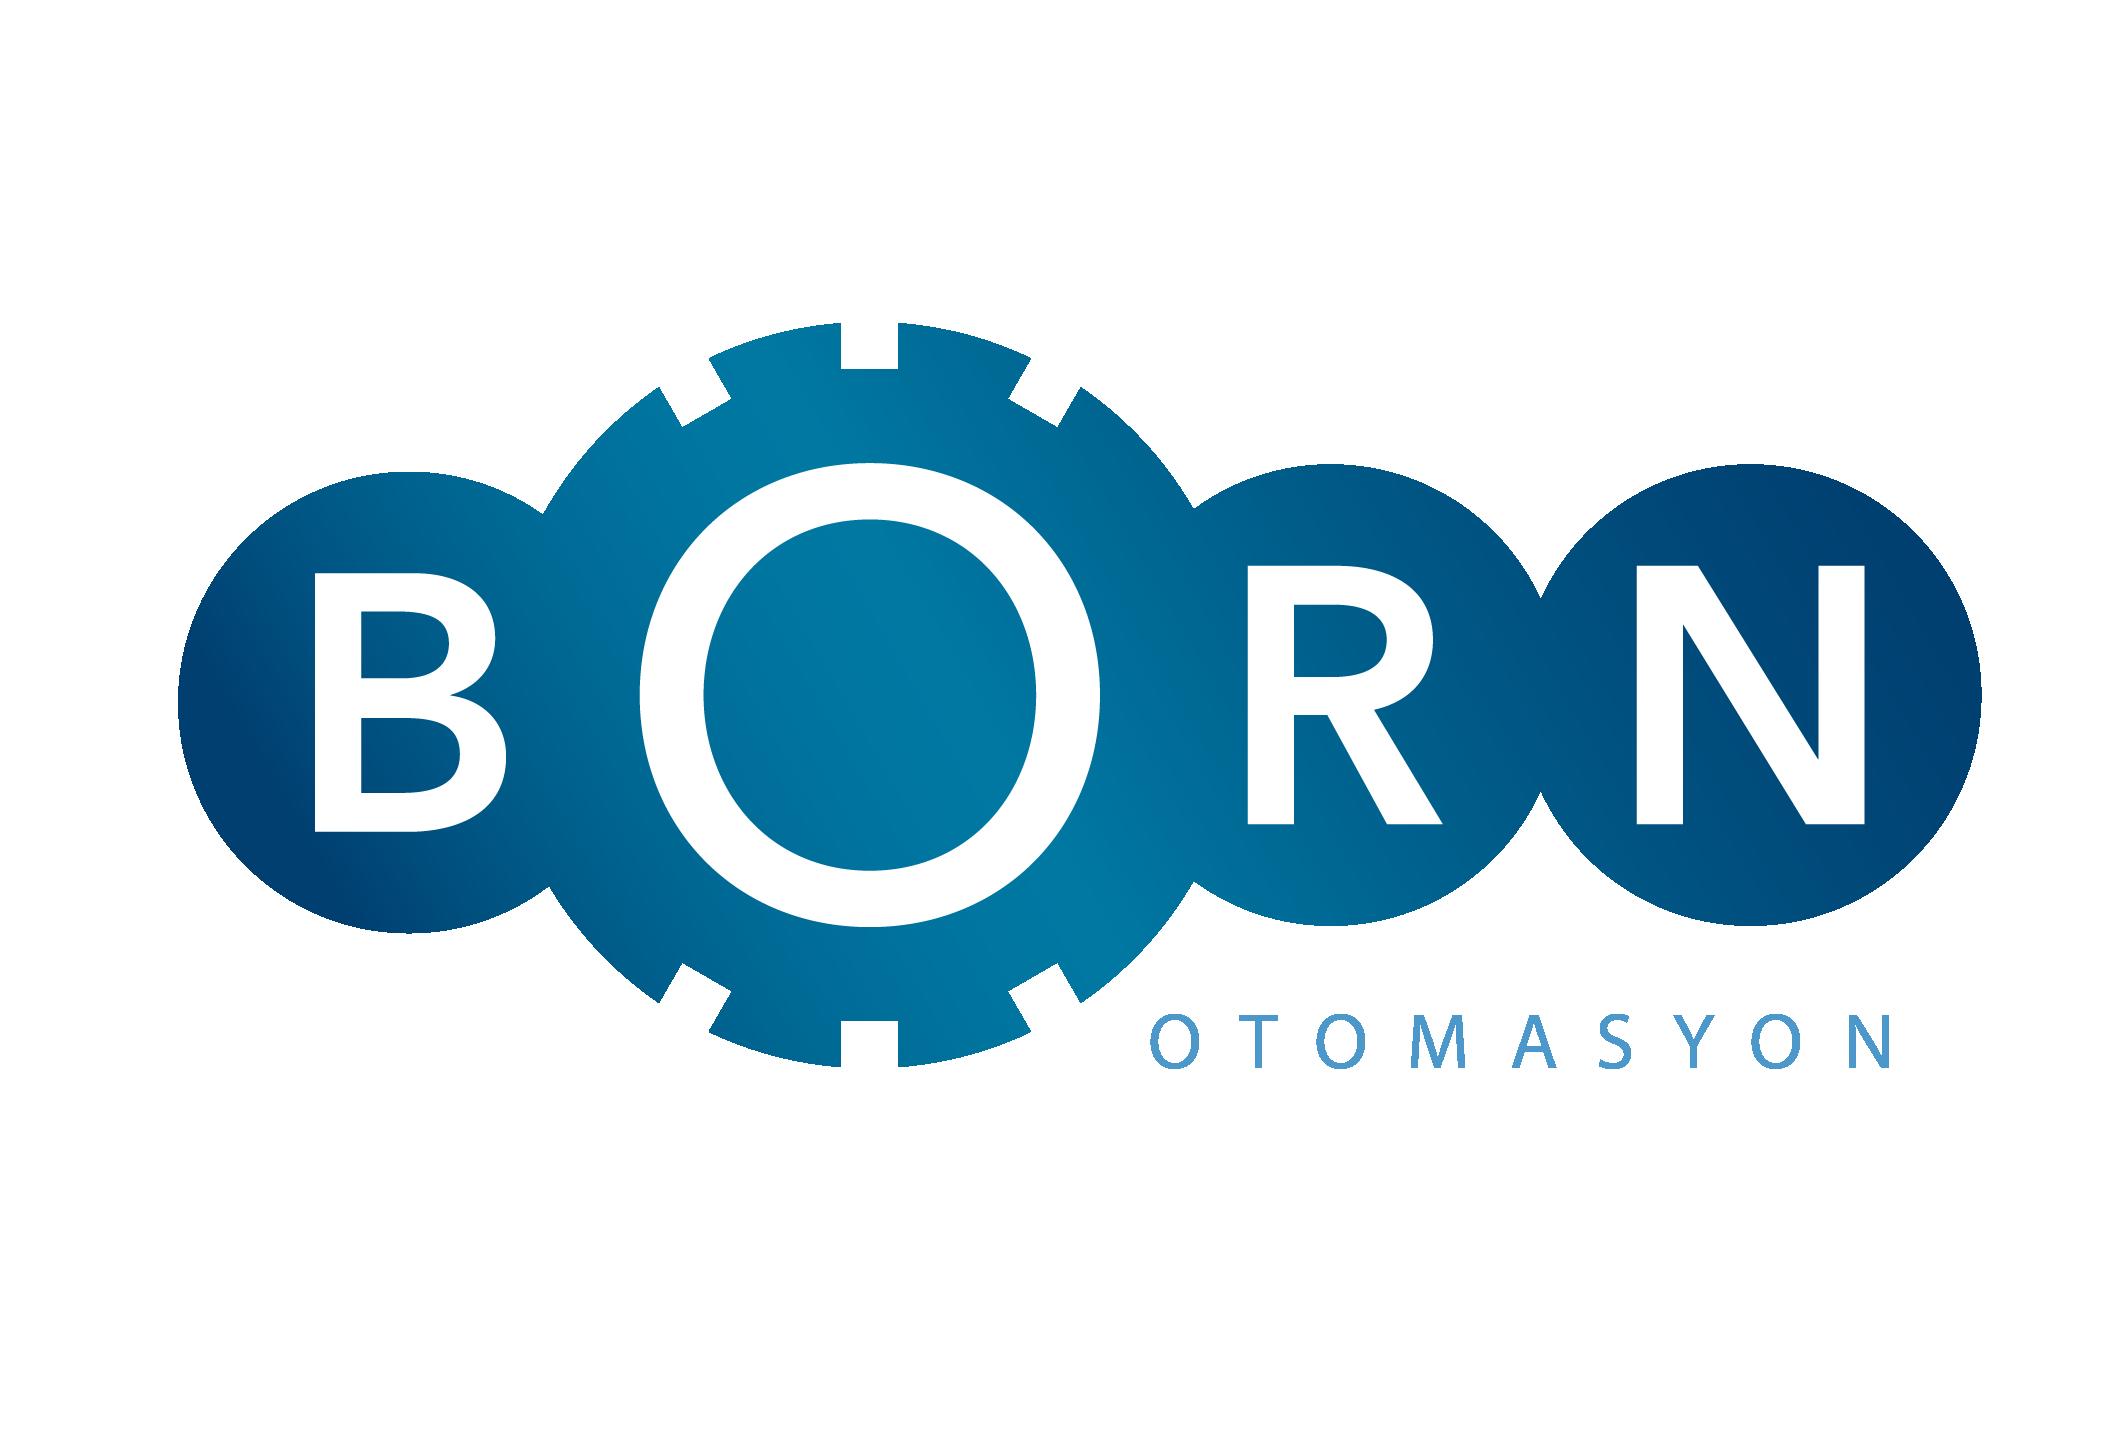 born_otomasyon-02